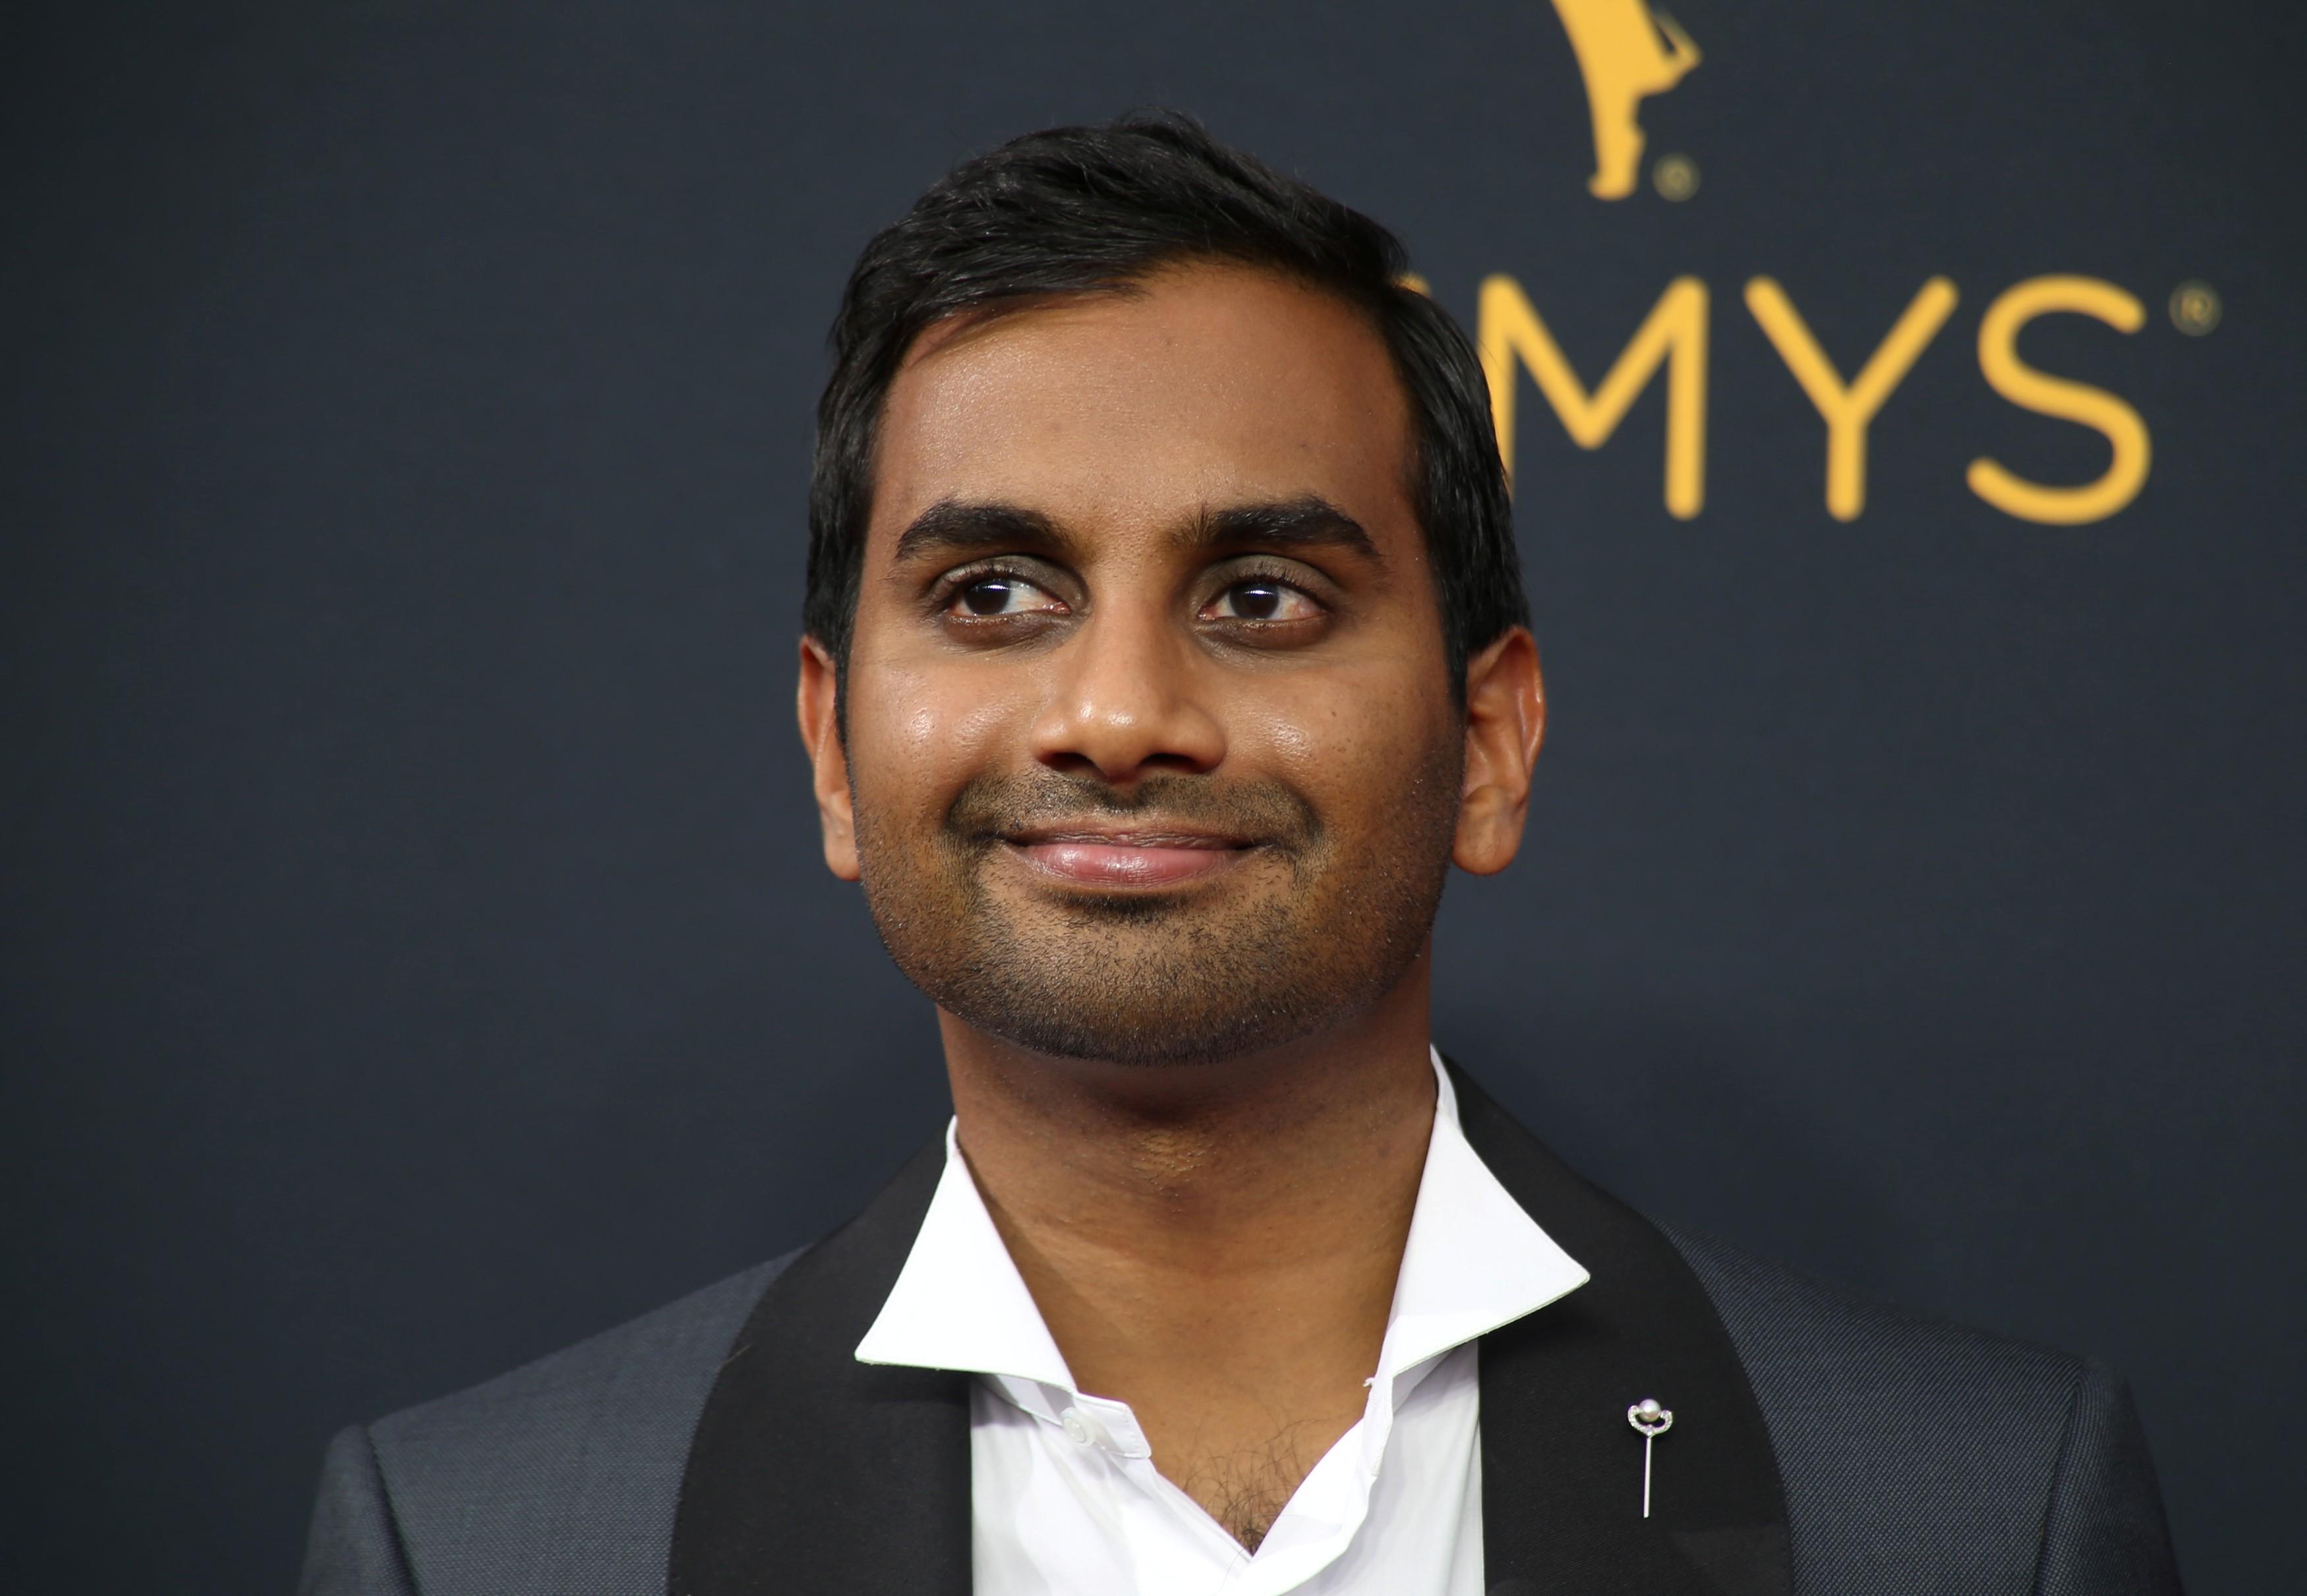 Aziz ansari neue york Zeiten online dating Verpflichtungsphobie datiert